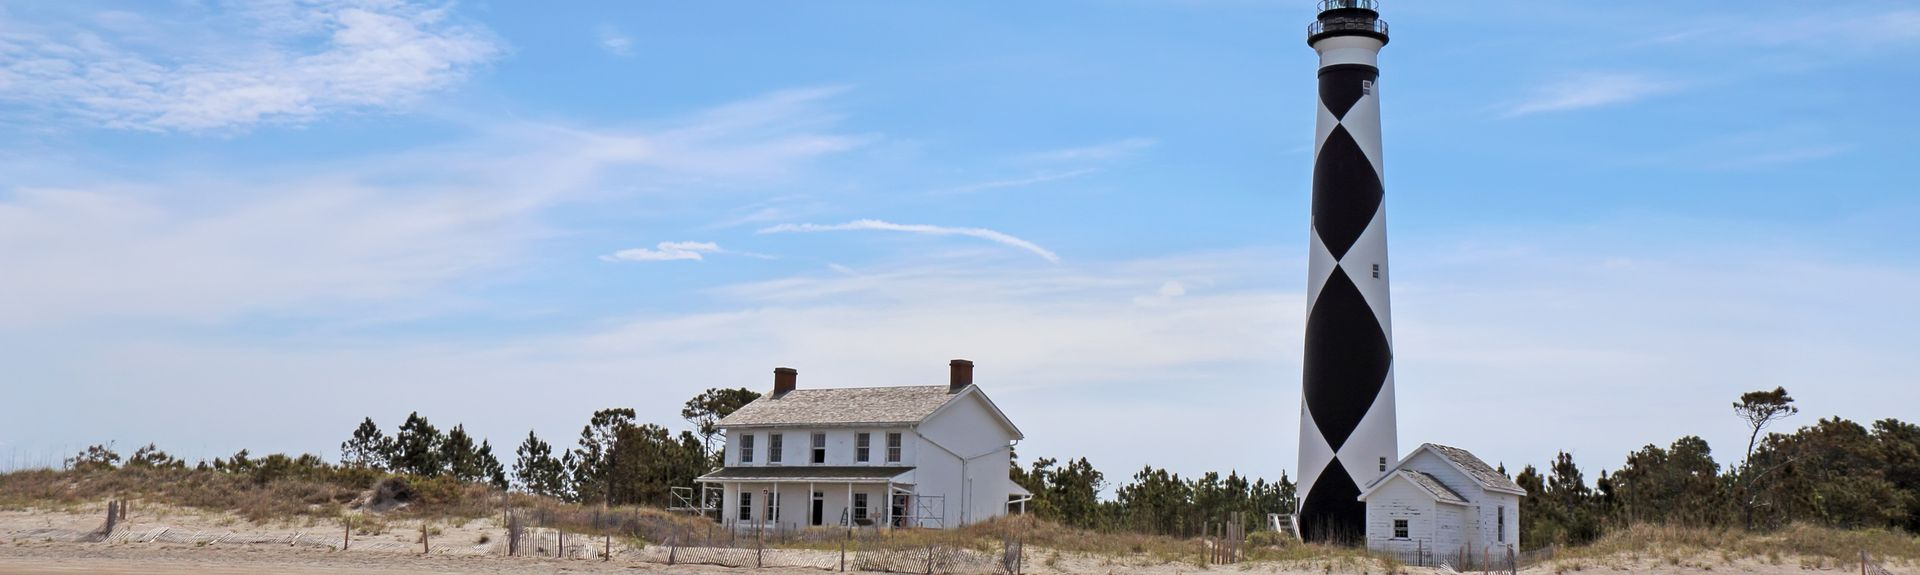 Harkers Island, North Carolina, United States of America